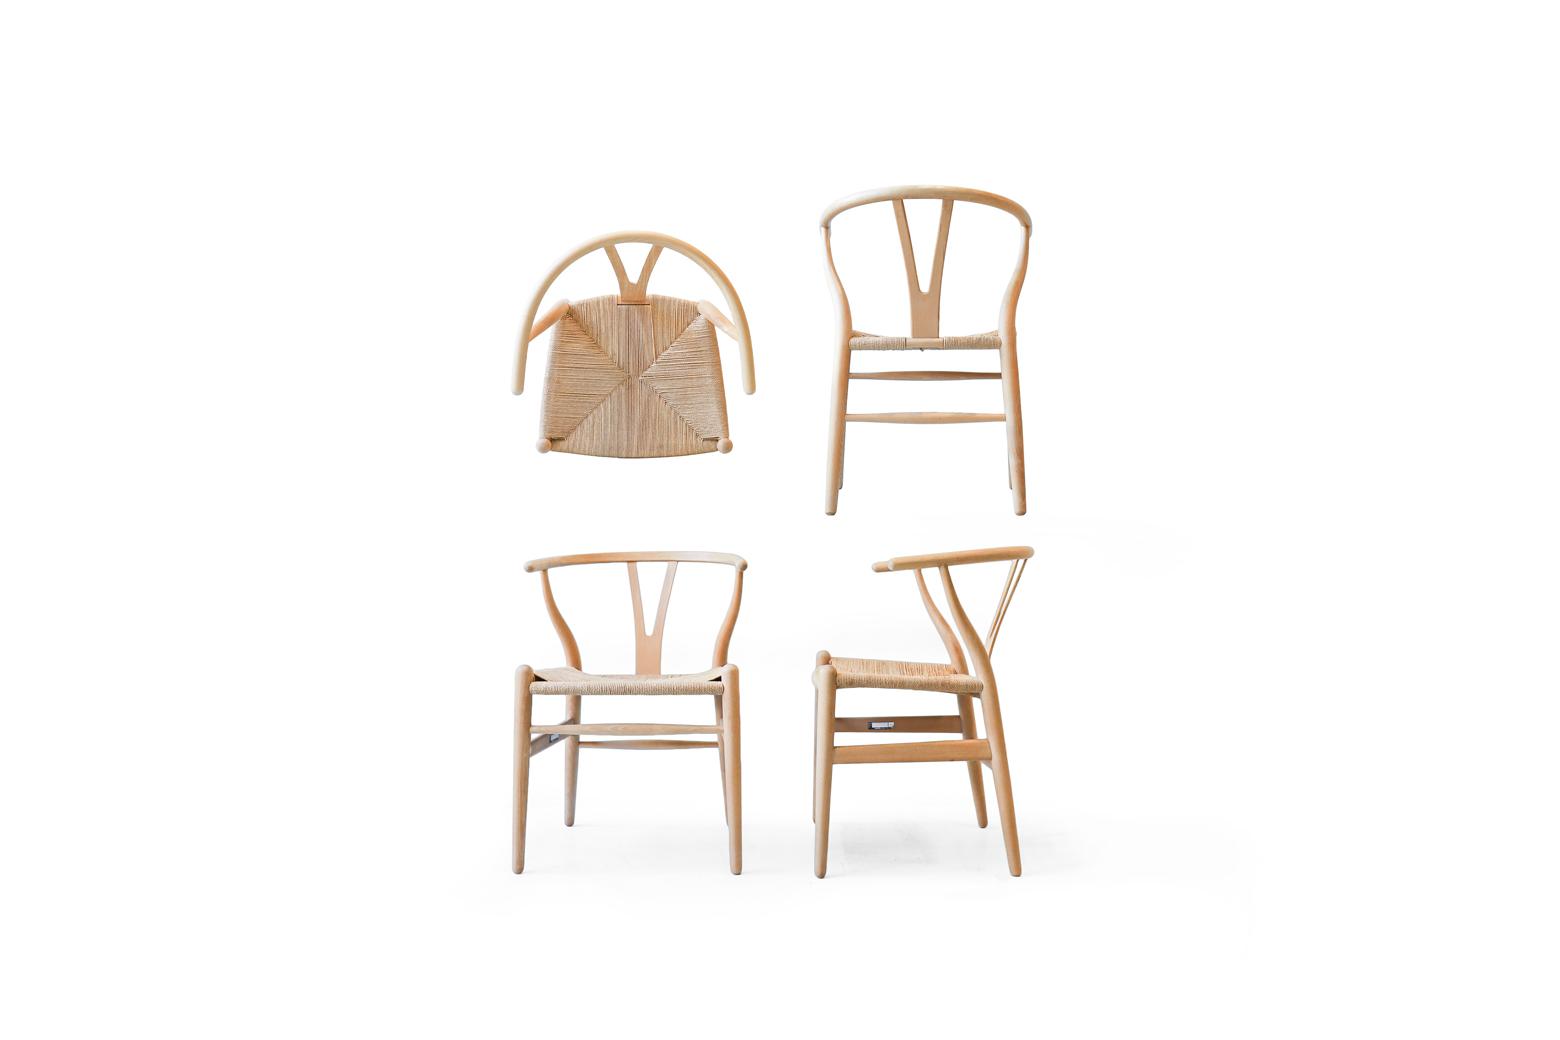 Carl Hansen&Søn Wishbone Chair CH24 Hans J.Wegner/カール・ハンセン&サン Yチェア ハンス・J・ウェグナー ダイニングチェア 北欧家具